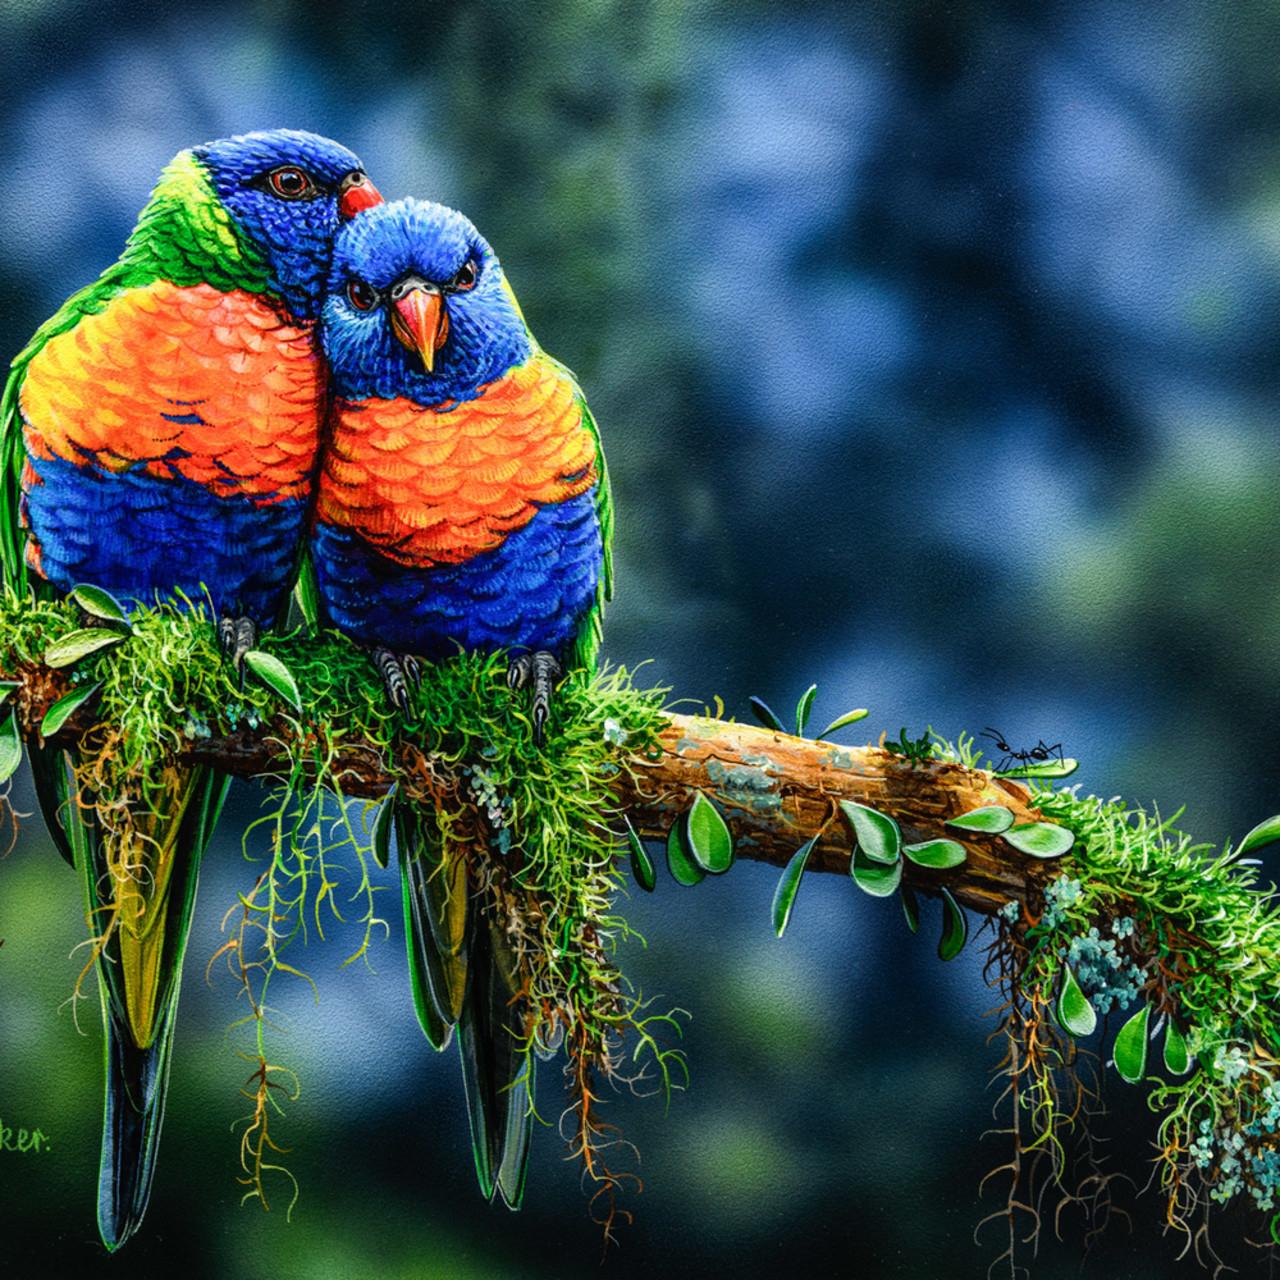 Morning snuggles   rainbow lorikeet natalie jane parker australian native wildlife ahjelc